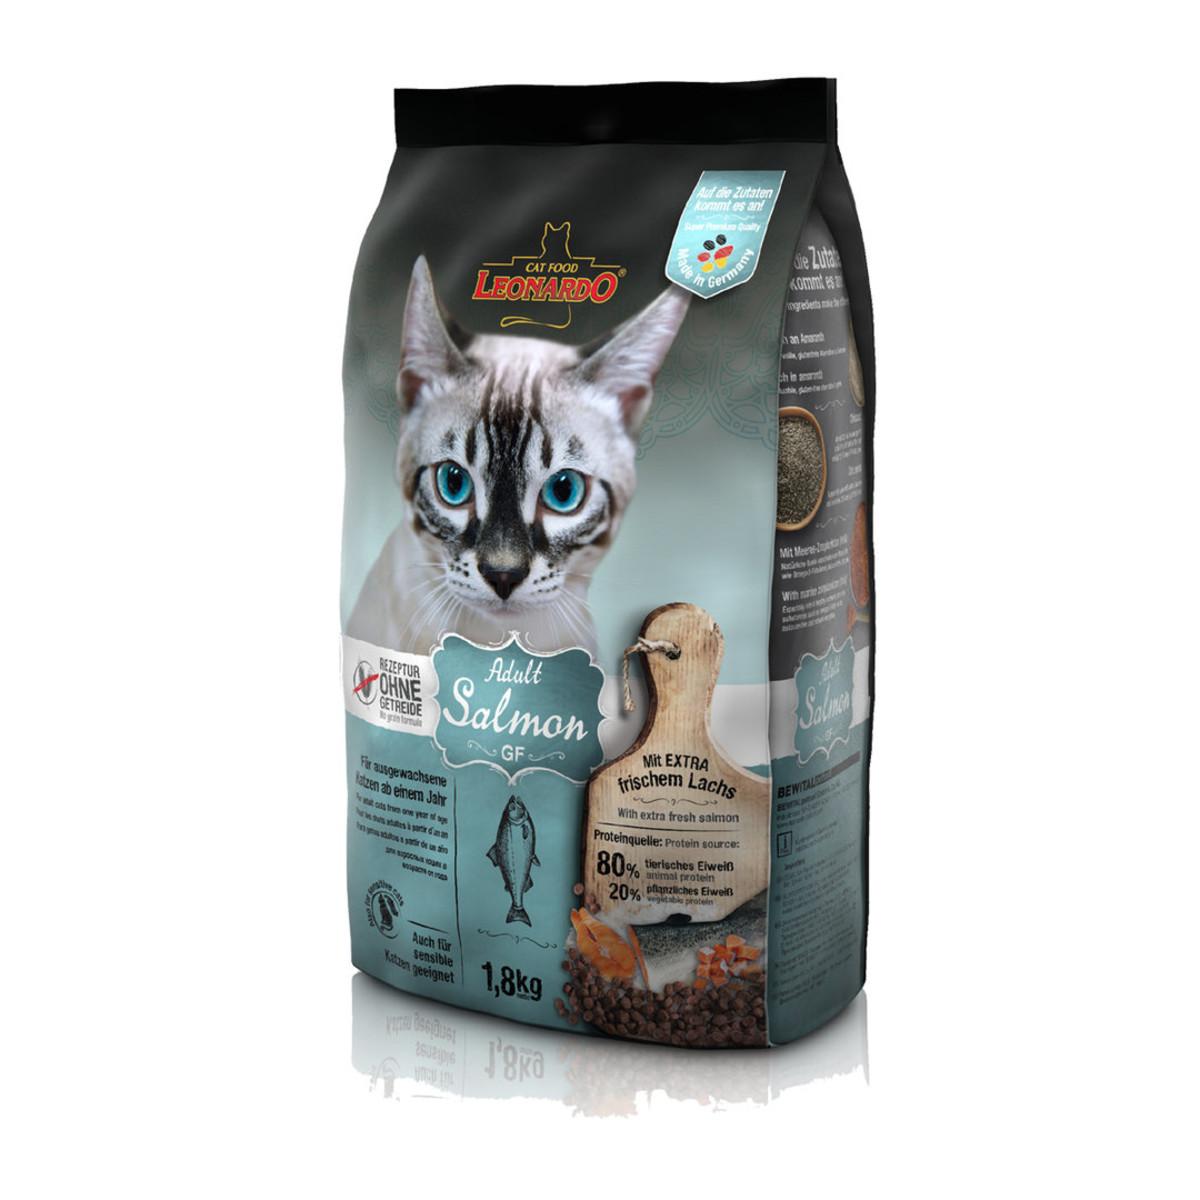 Сухой корм для кошек Leonardo 18 кг 1 шт